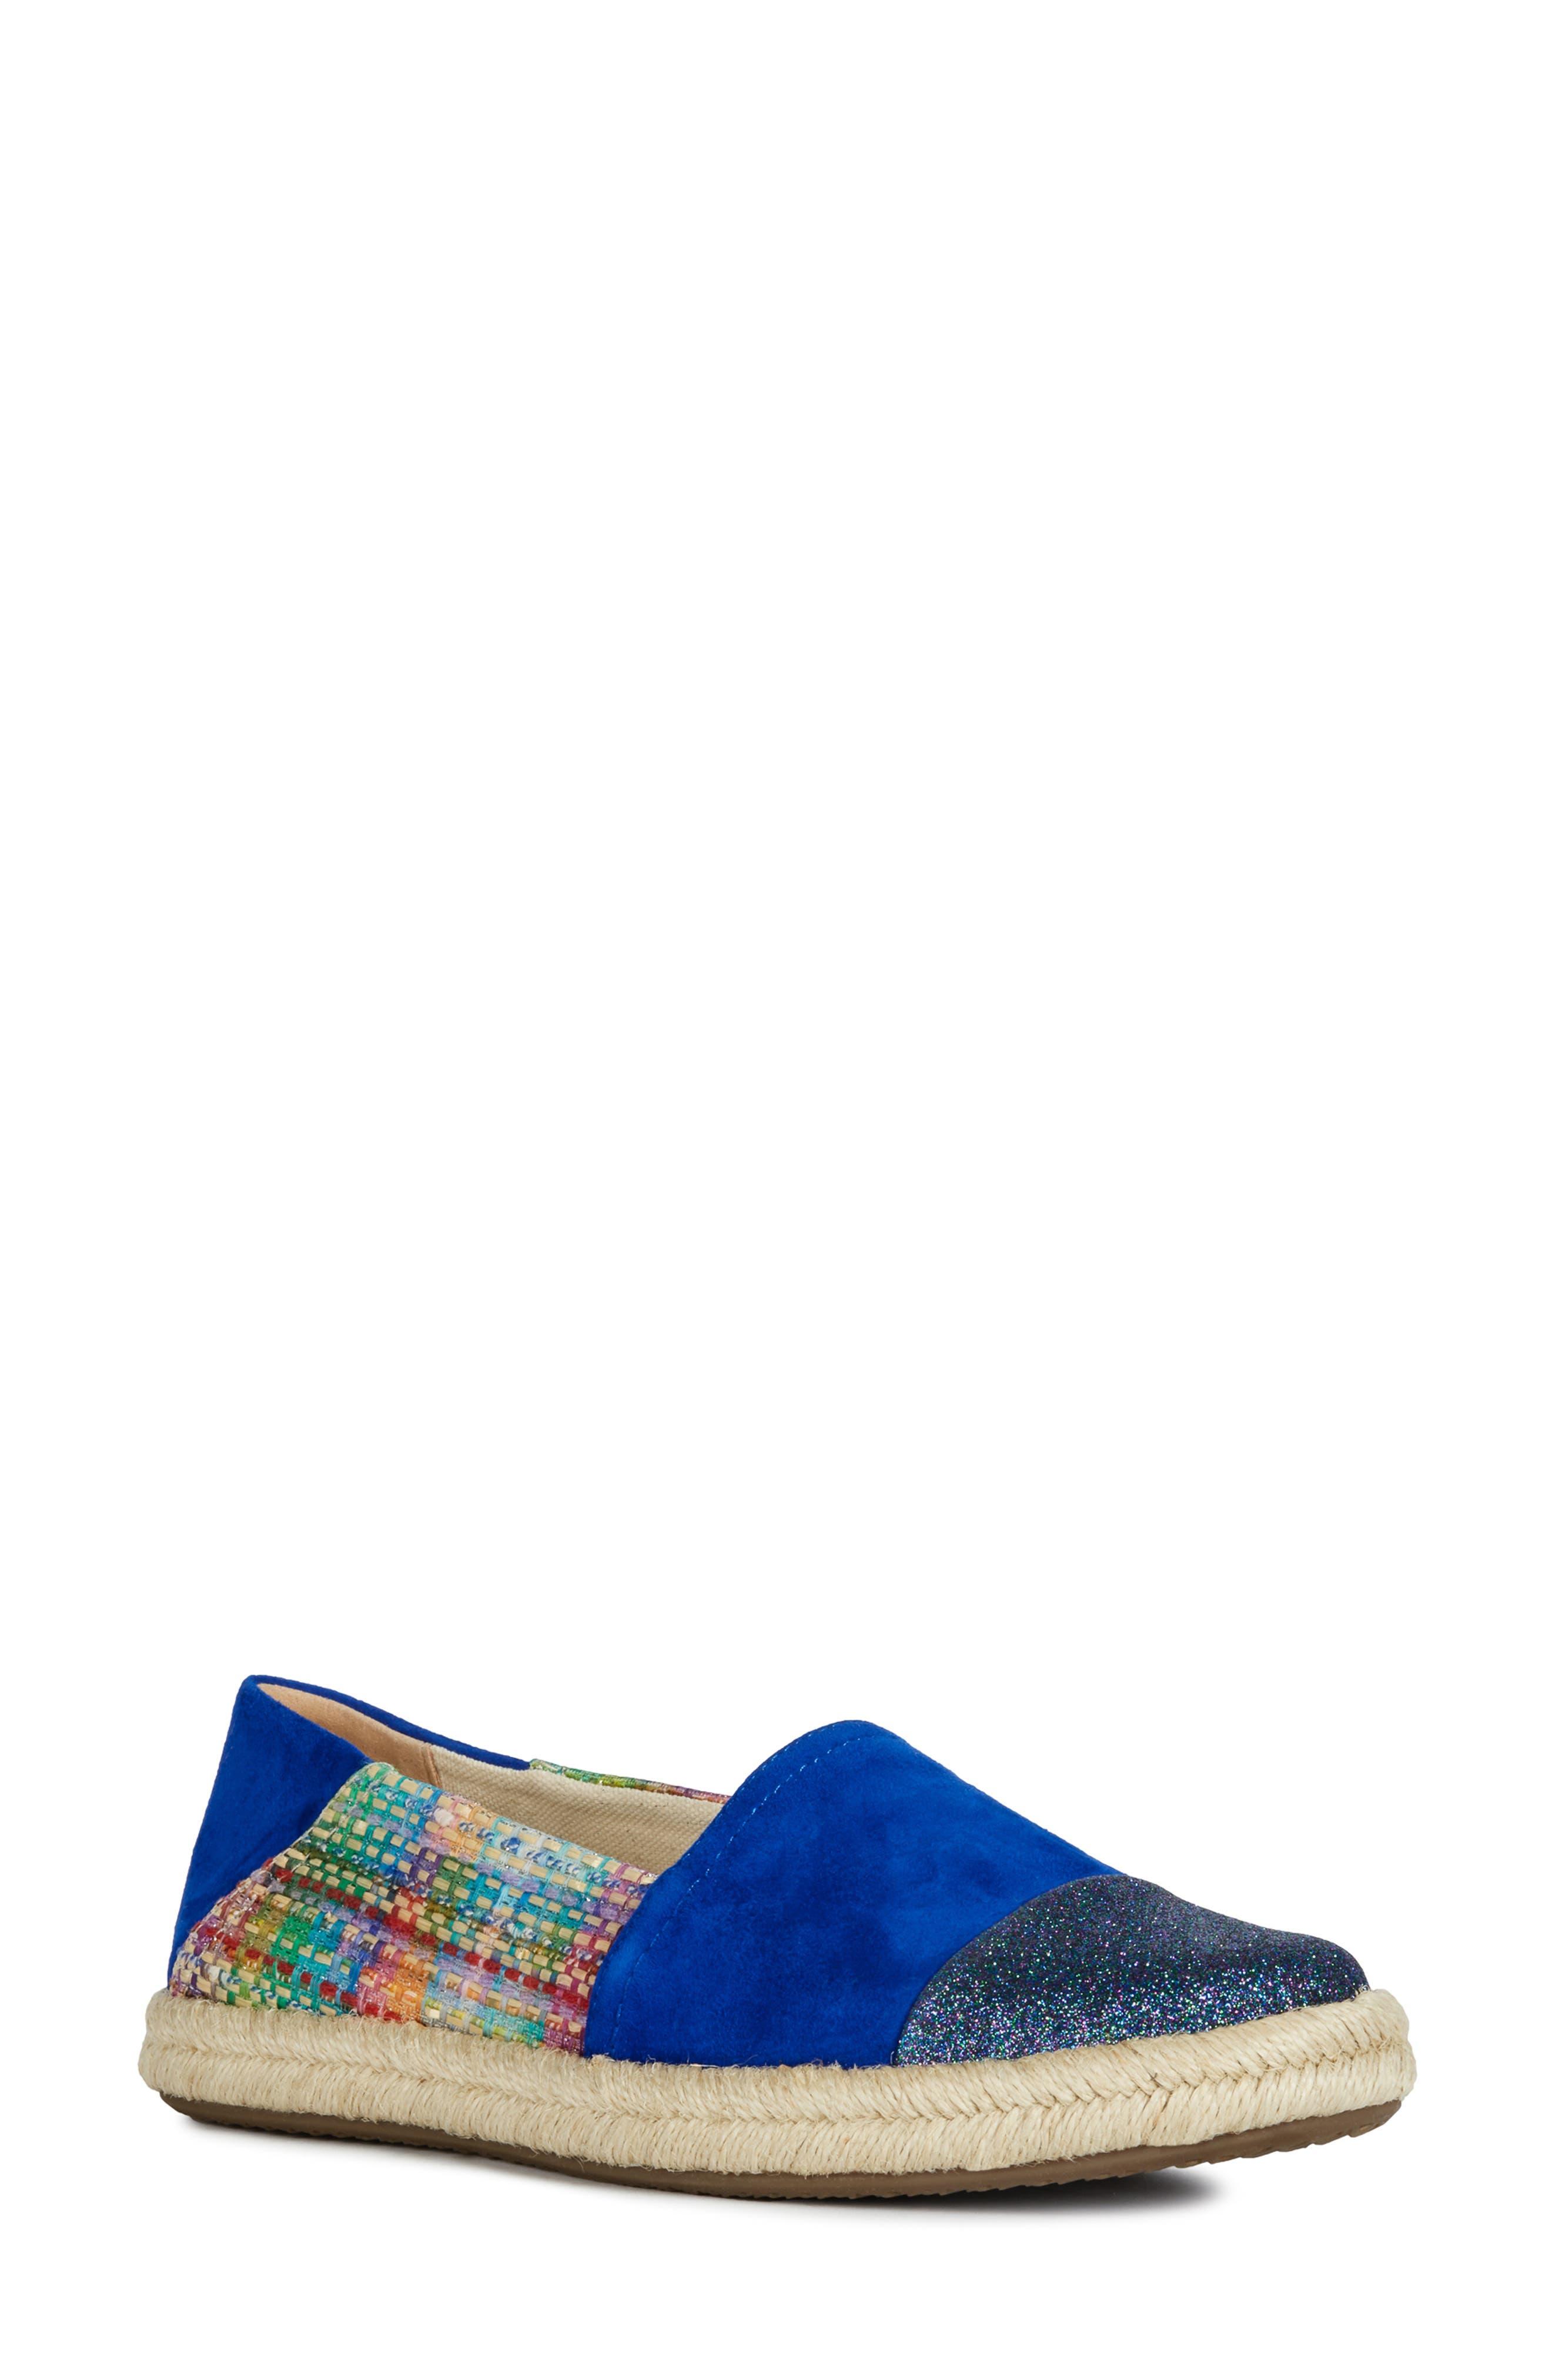 Geox Modesty 41 Flat, Blue